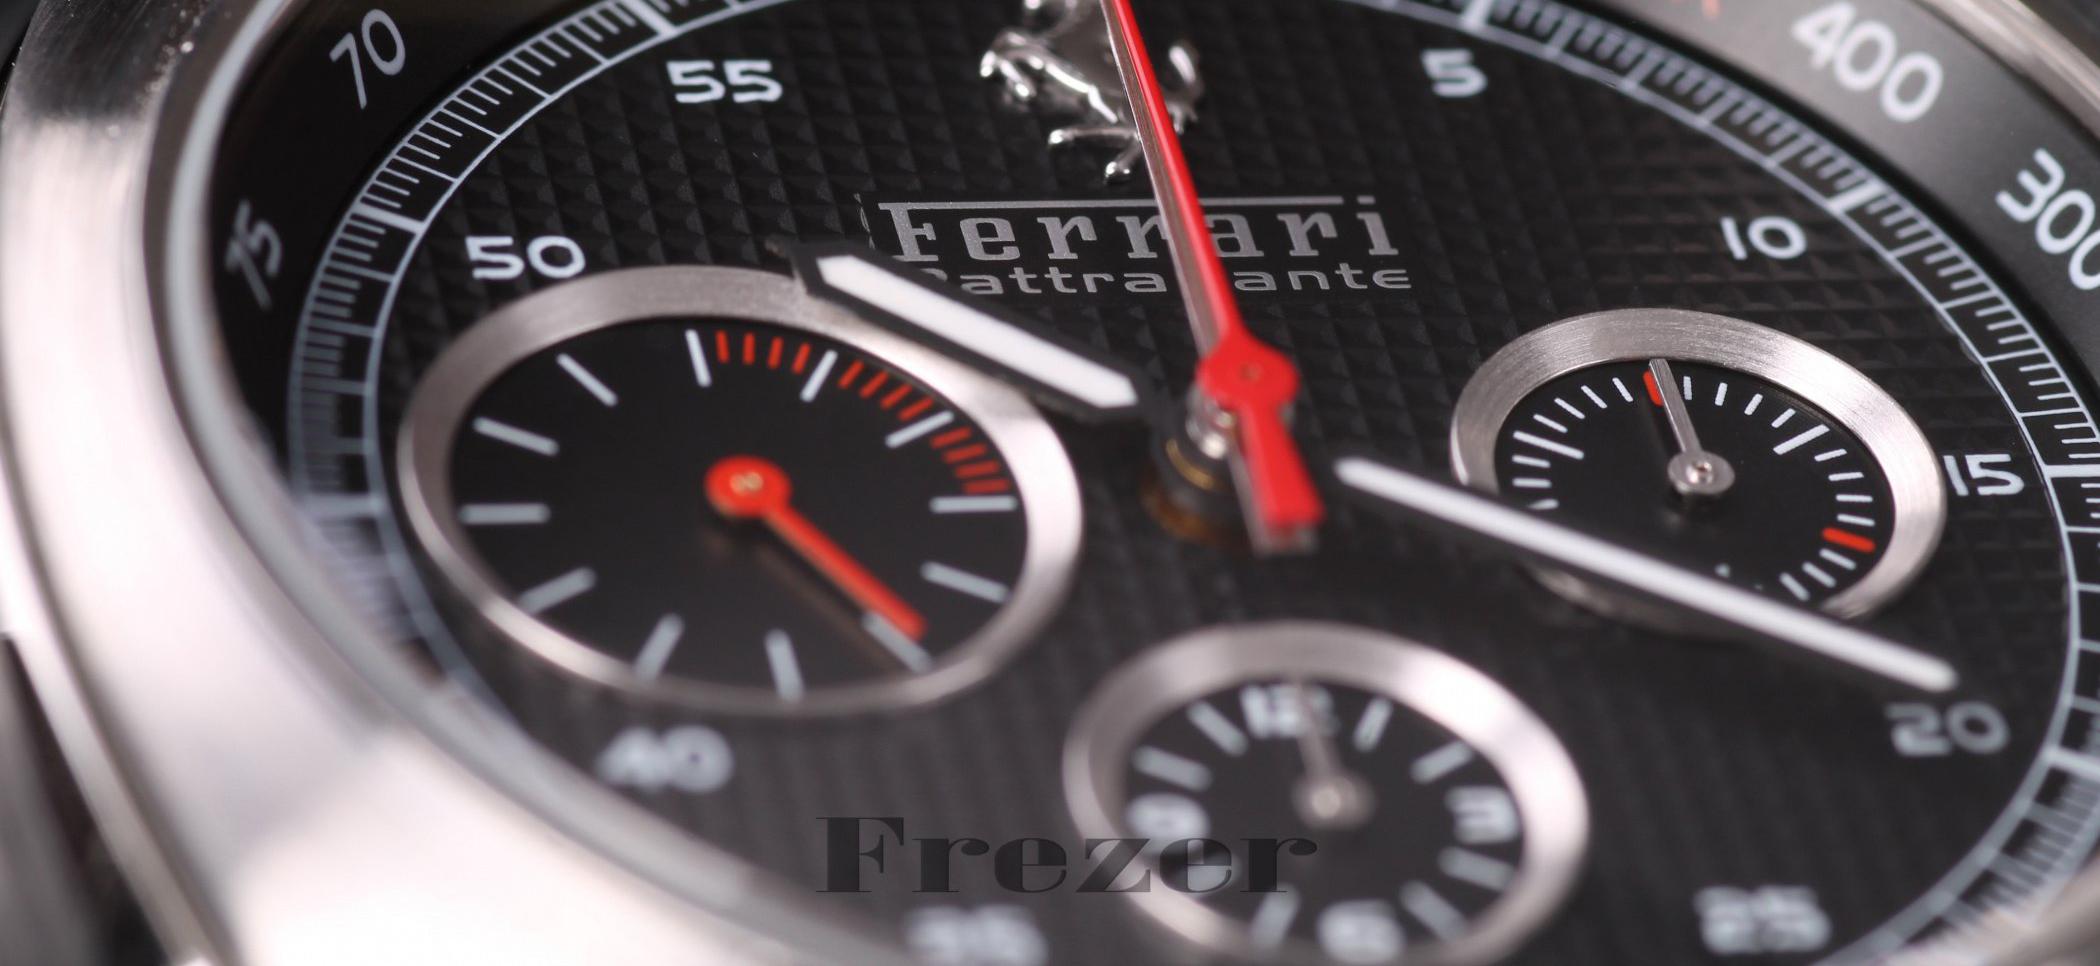 Panerai Ferrari Collection Granturismo Chronograph